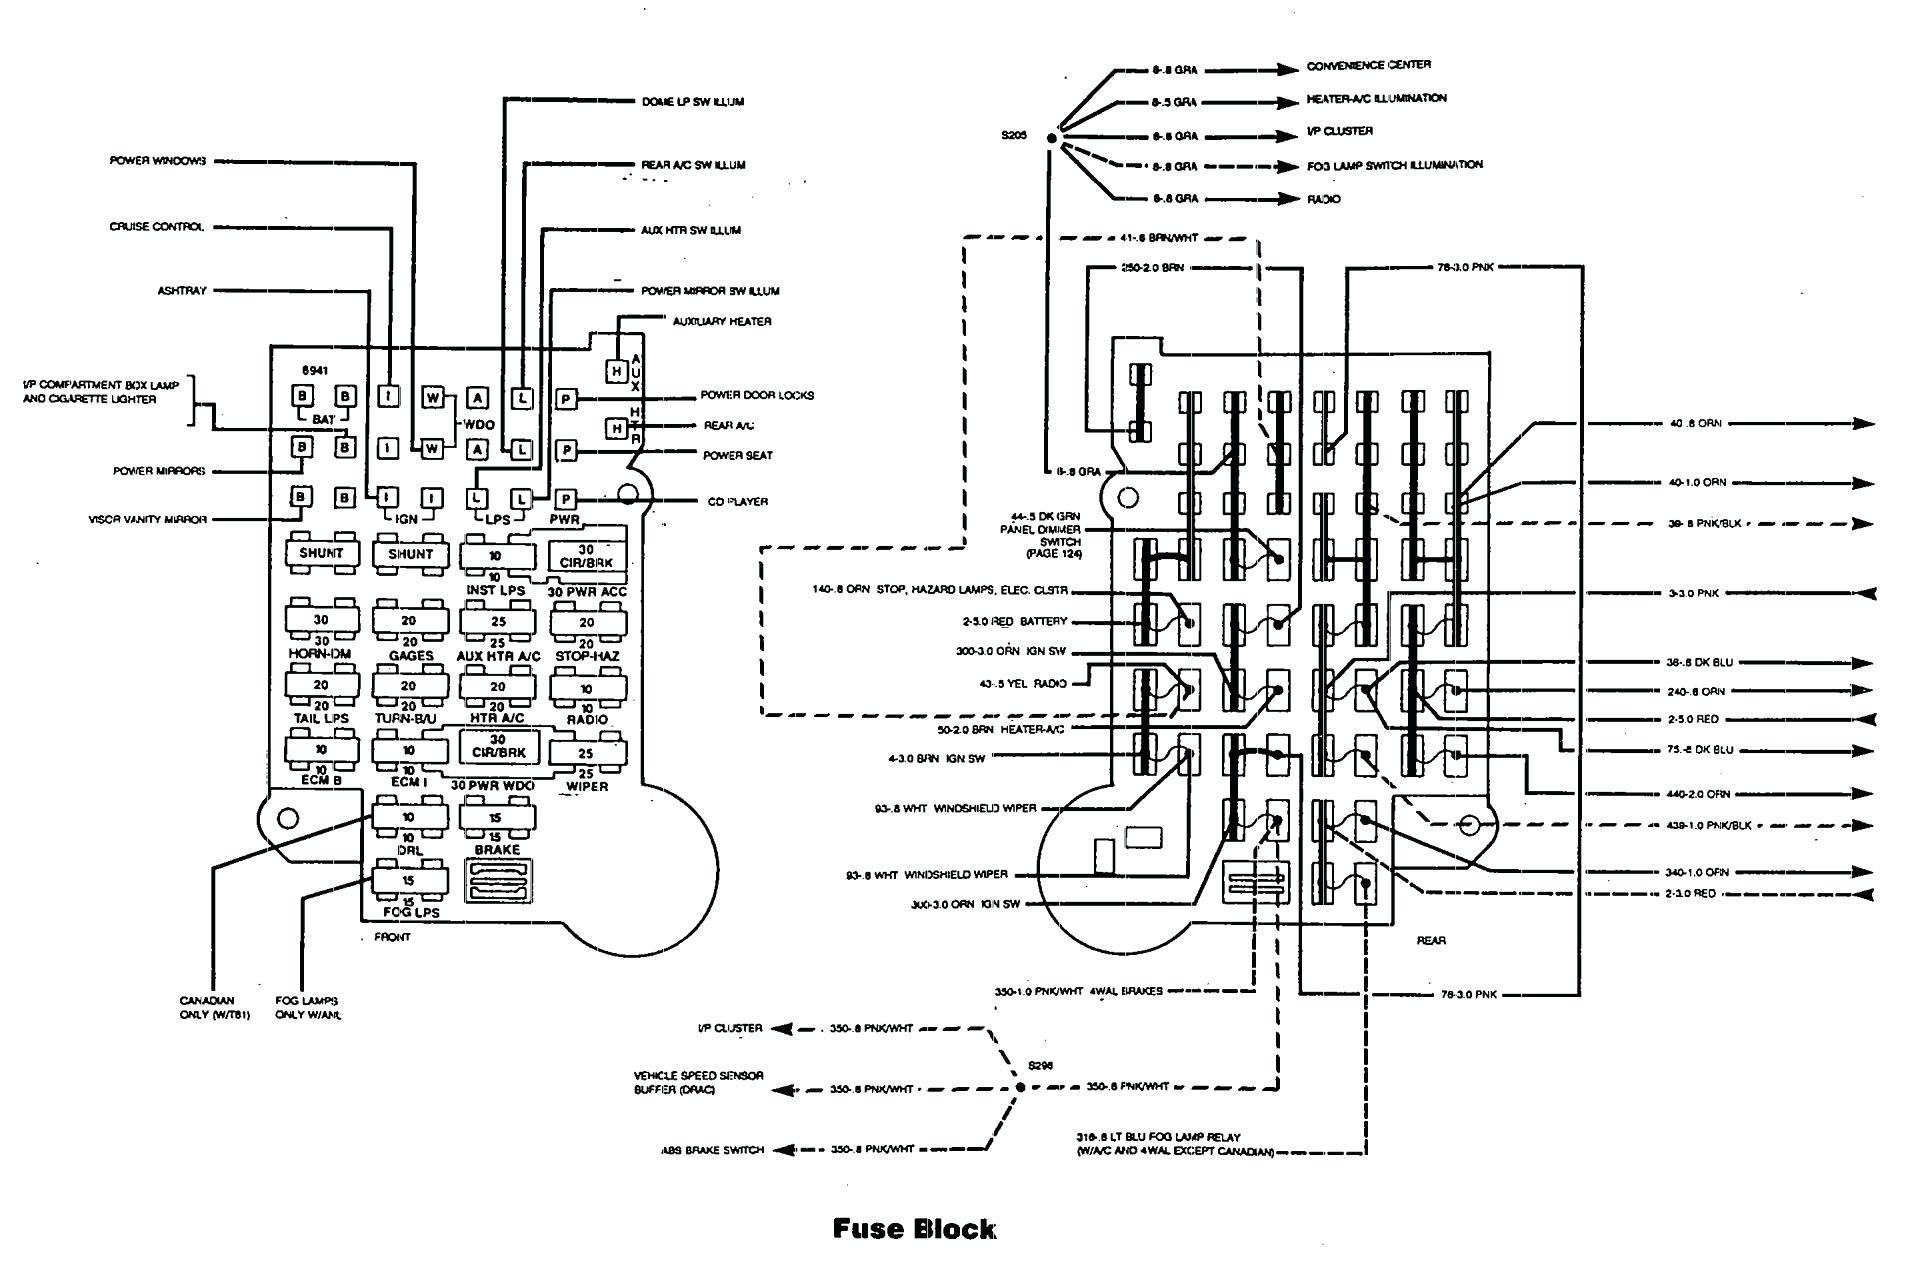 1995 kawasaki vulcan 1500 wiring diagram best wiring library rh 140 princestaash org